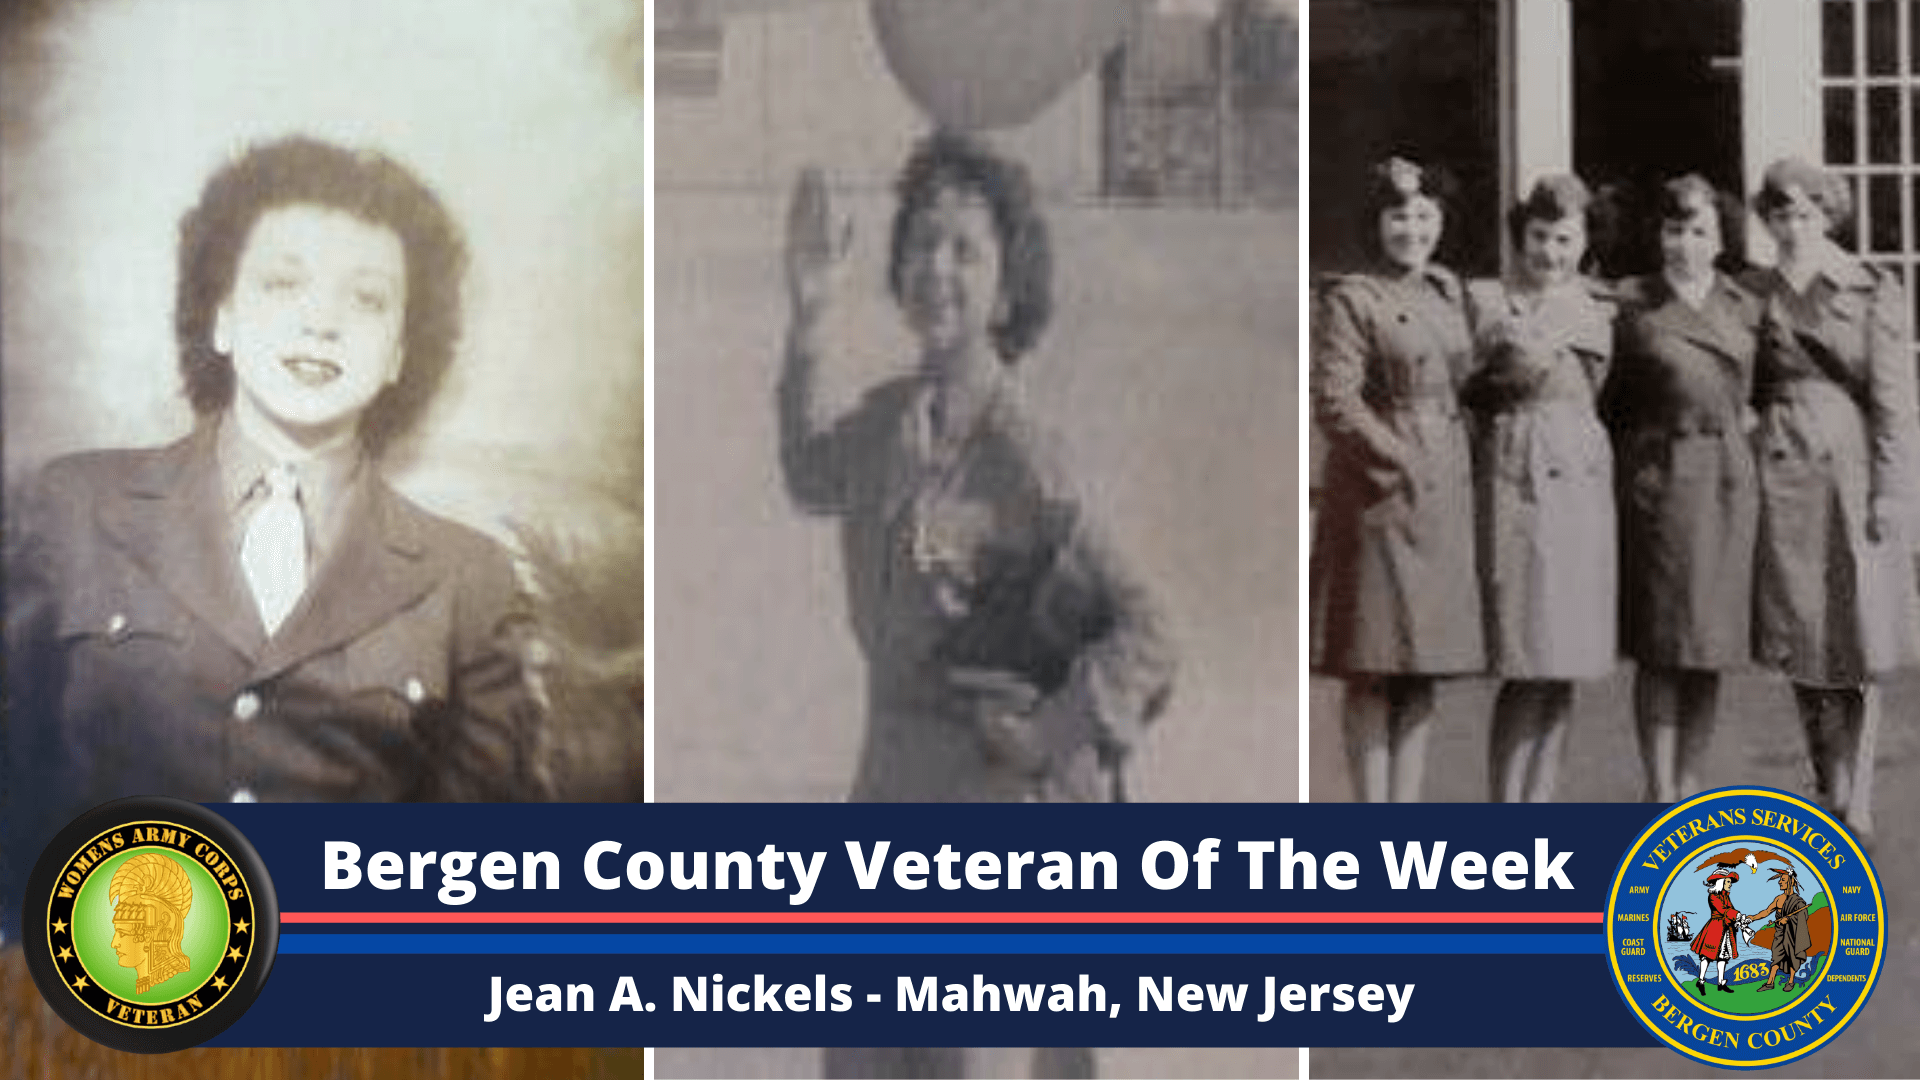 Bergen County Veteran of the Week: Jean A. Nickels